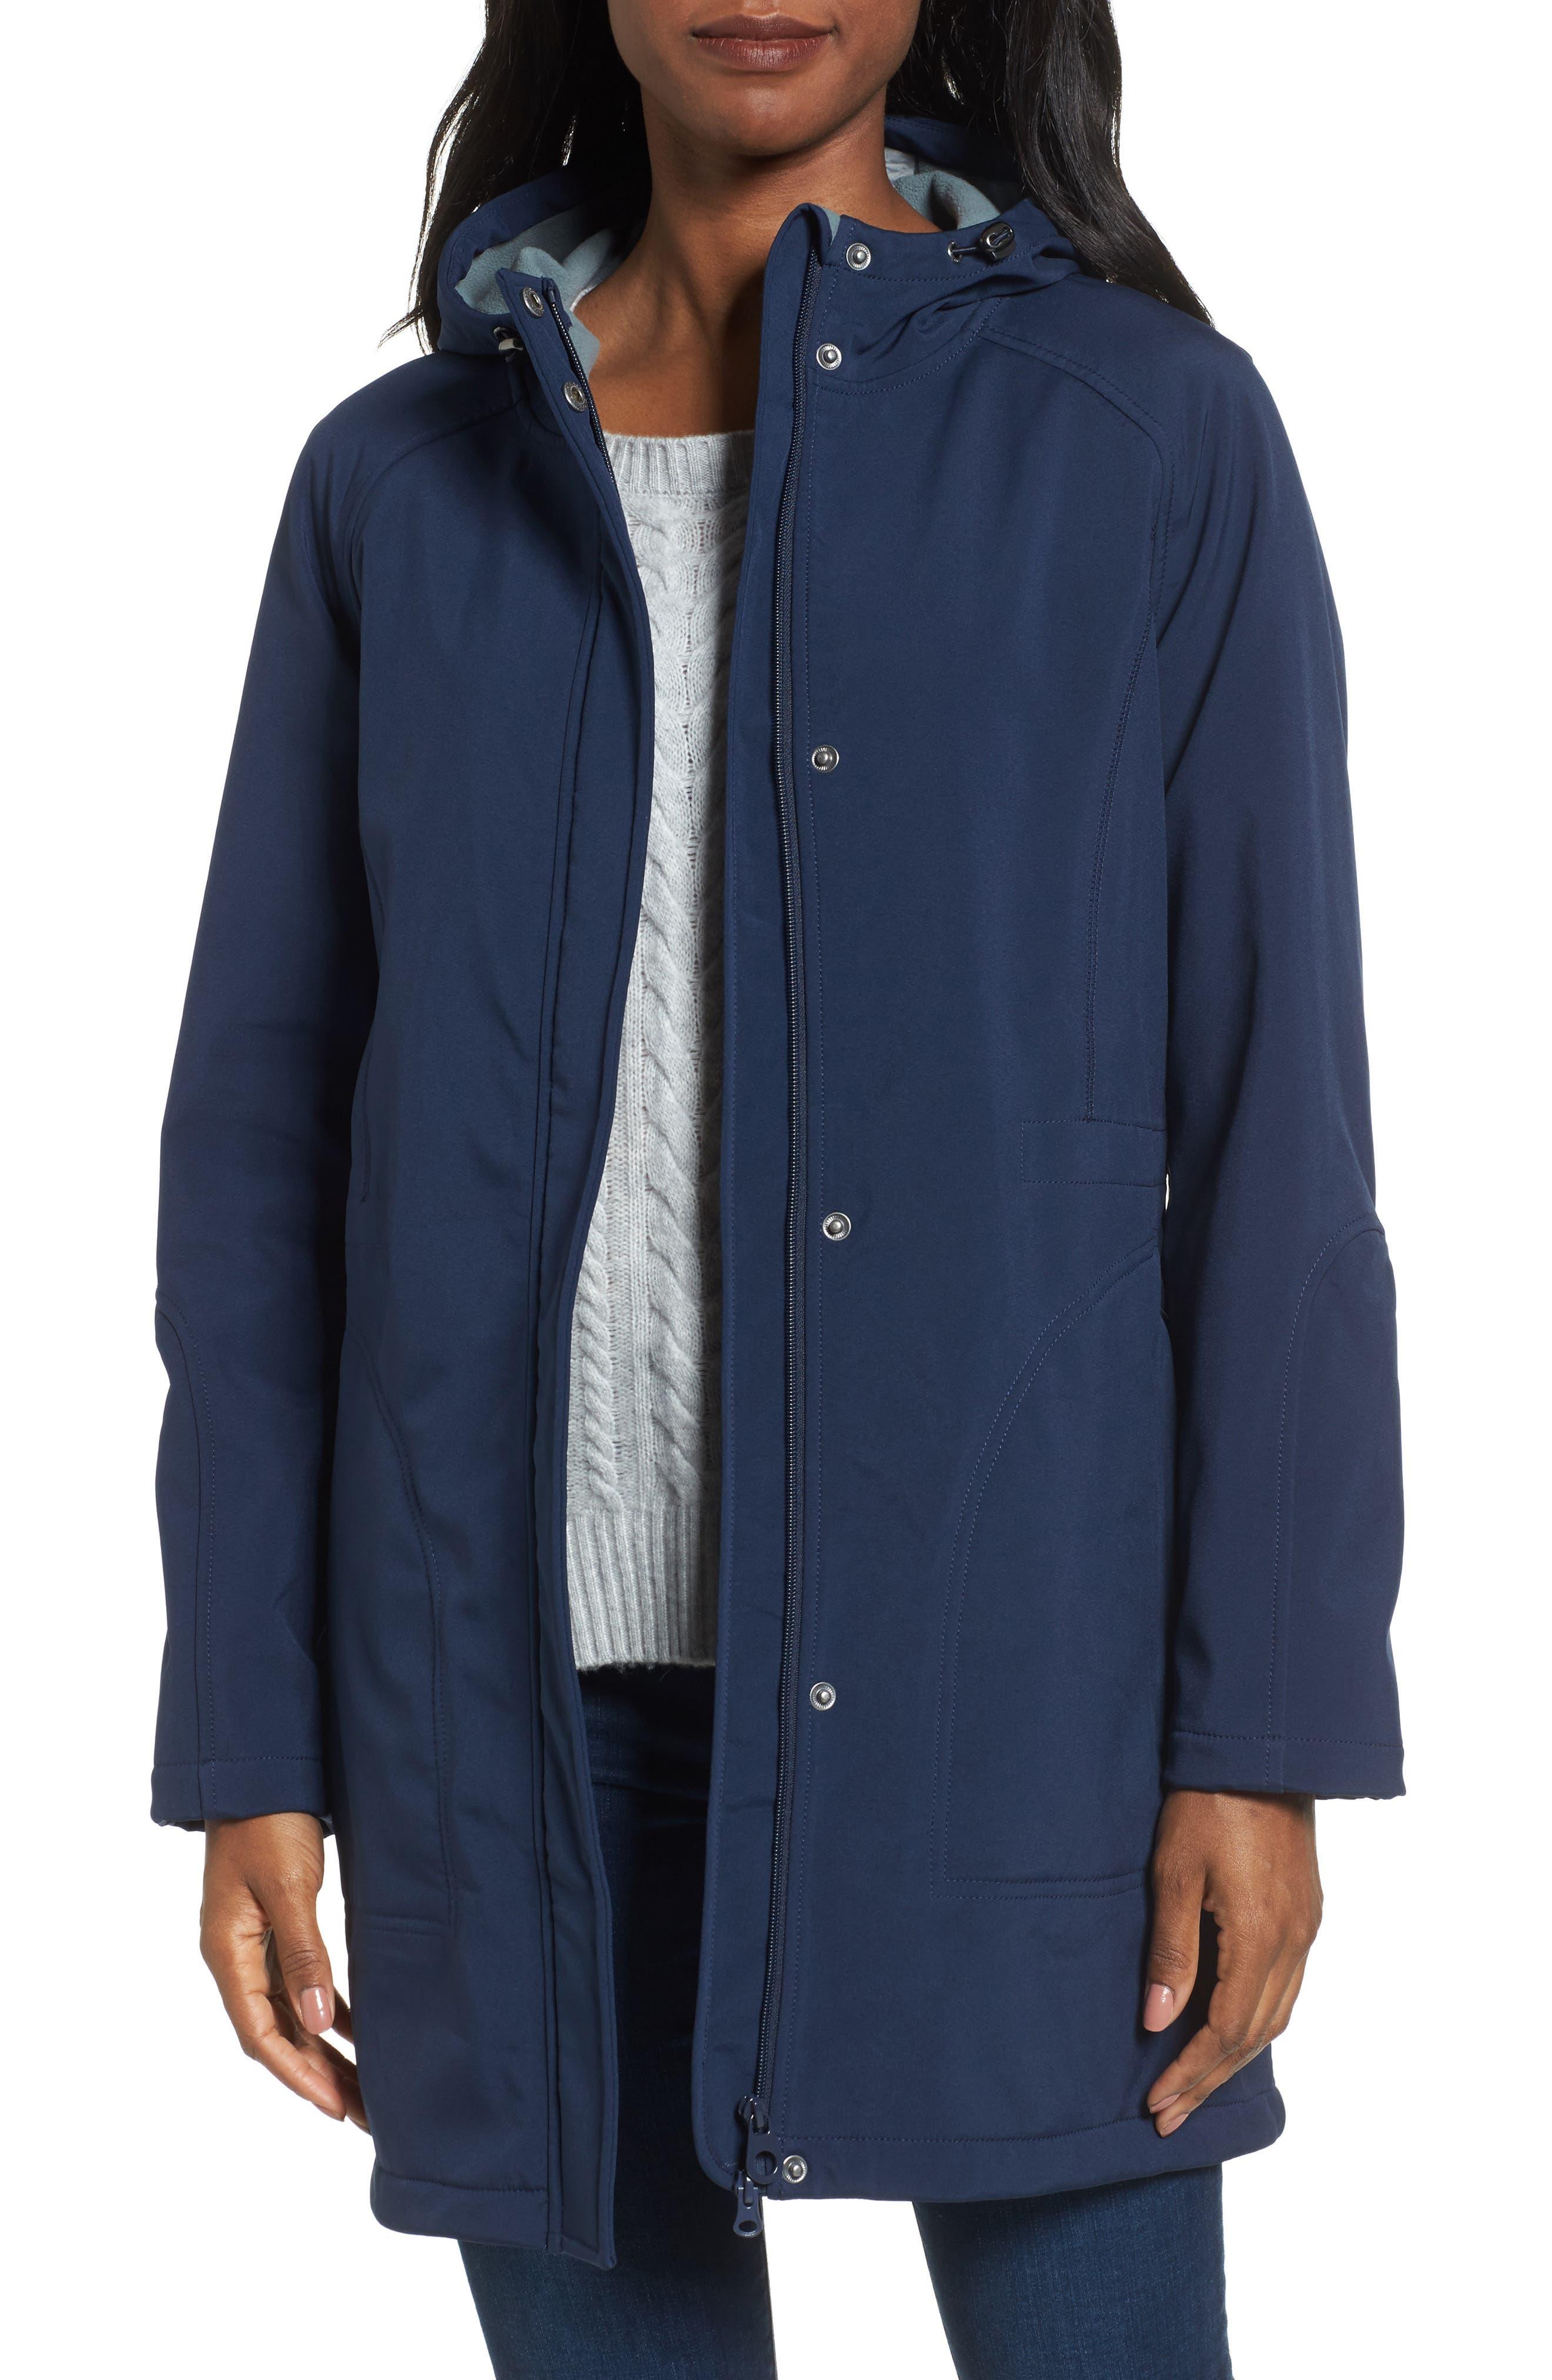 Main Image - Joules Right as Rain Fleece Lined Raincoat